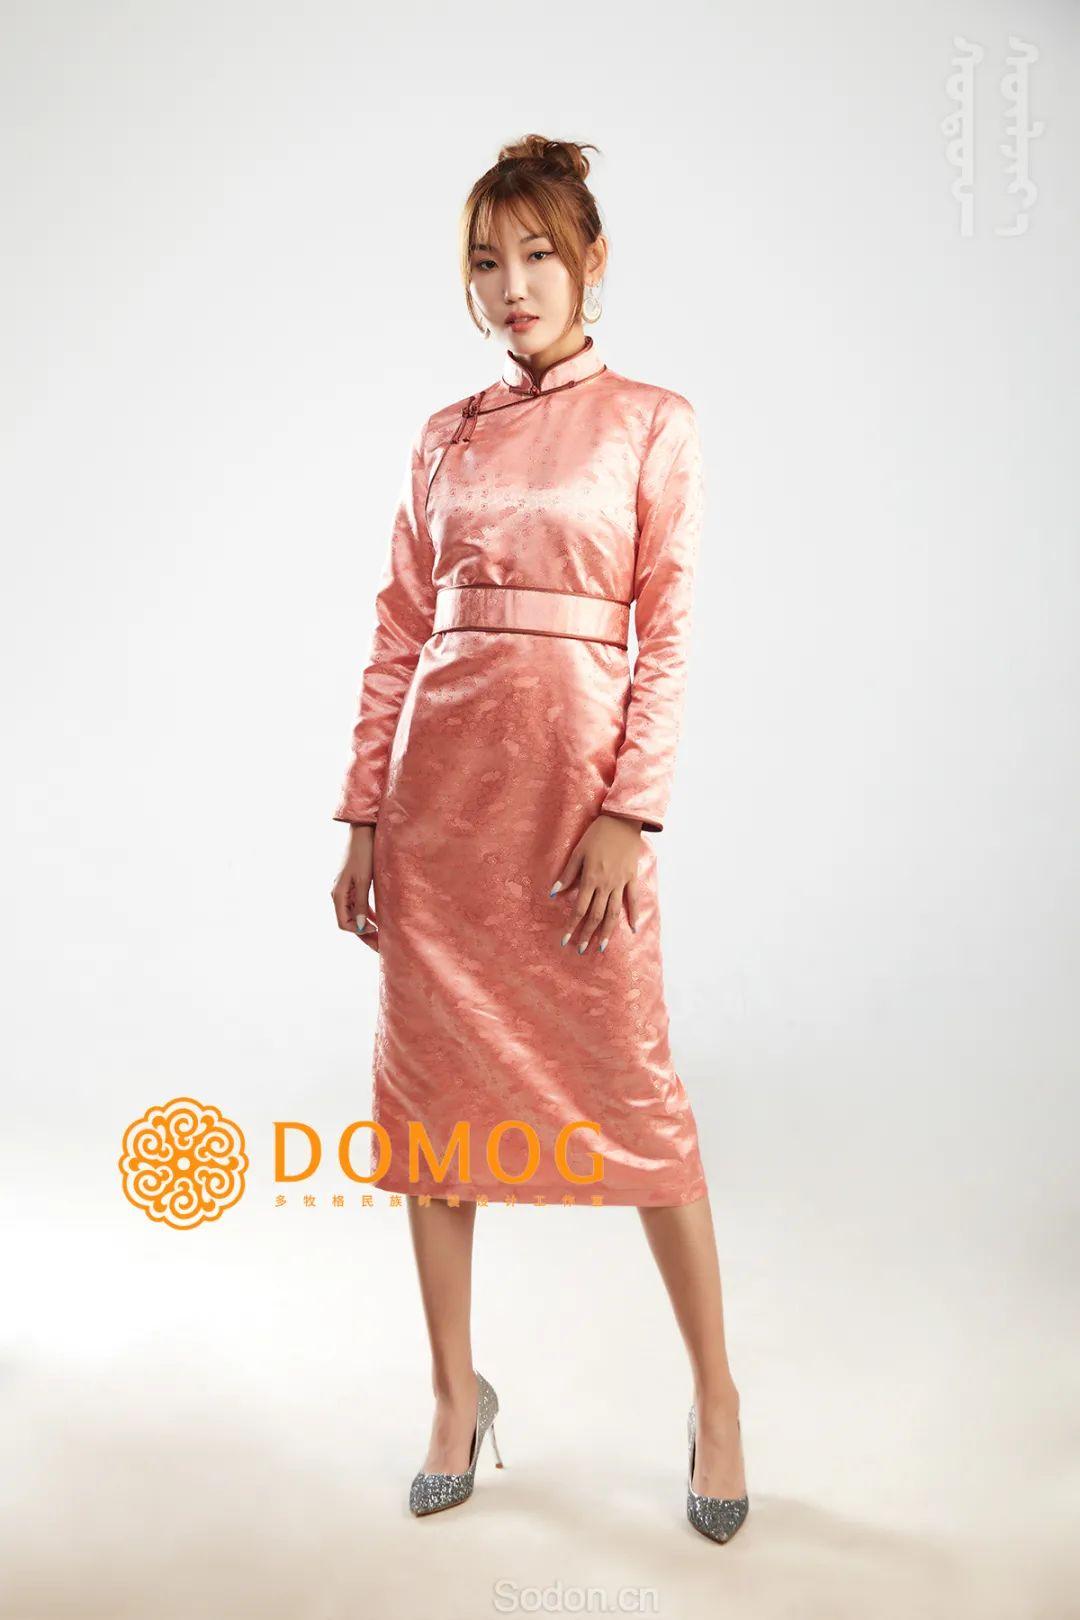 DOMOG 蒙古时装2020新款,民族与时尚的融合 第21张 DOMOG 蒙古时装2020新款,民族与时尚的融合 蒙古服饰